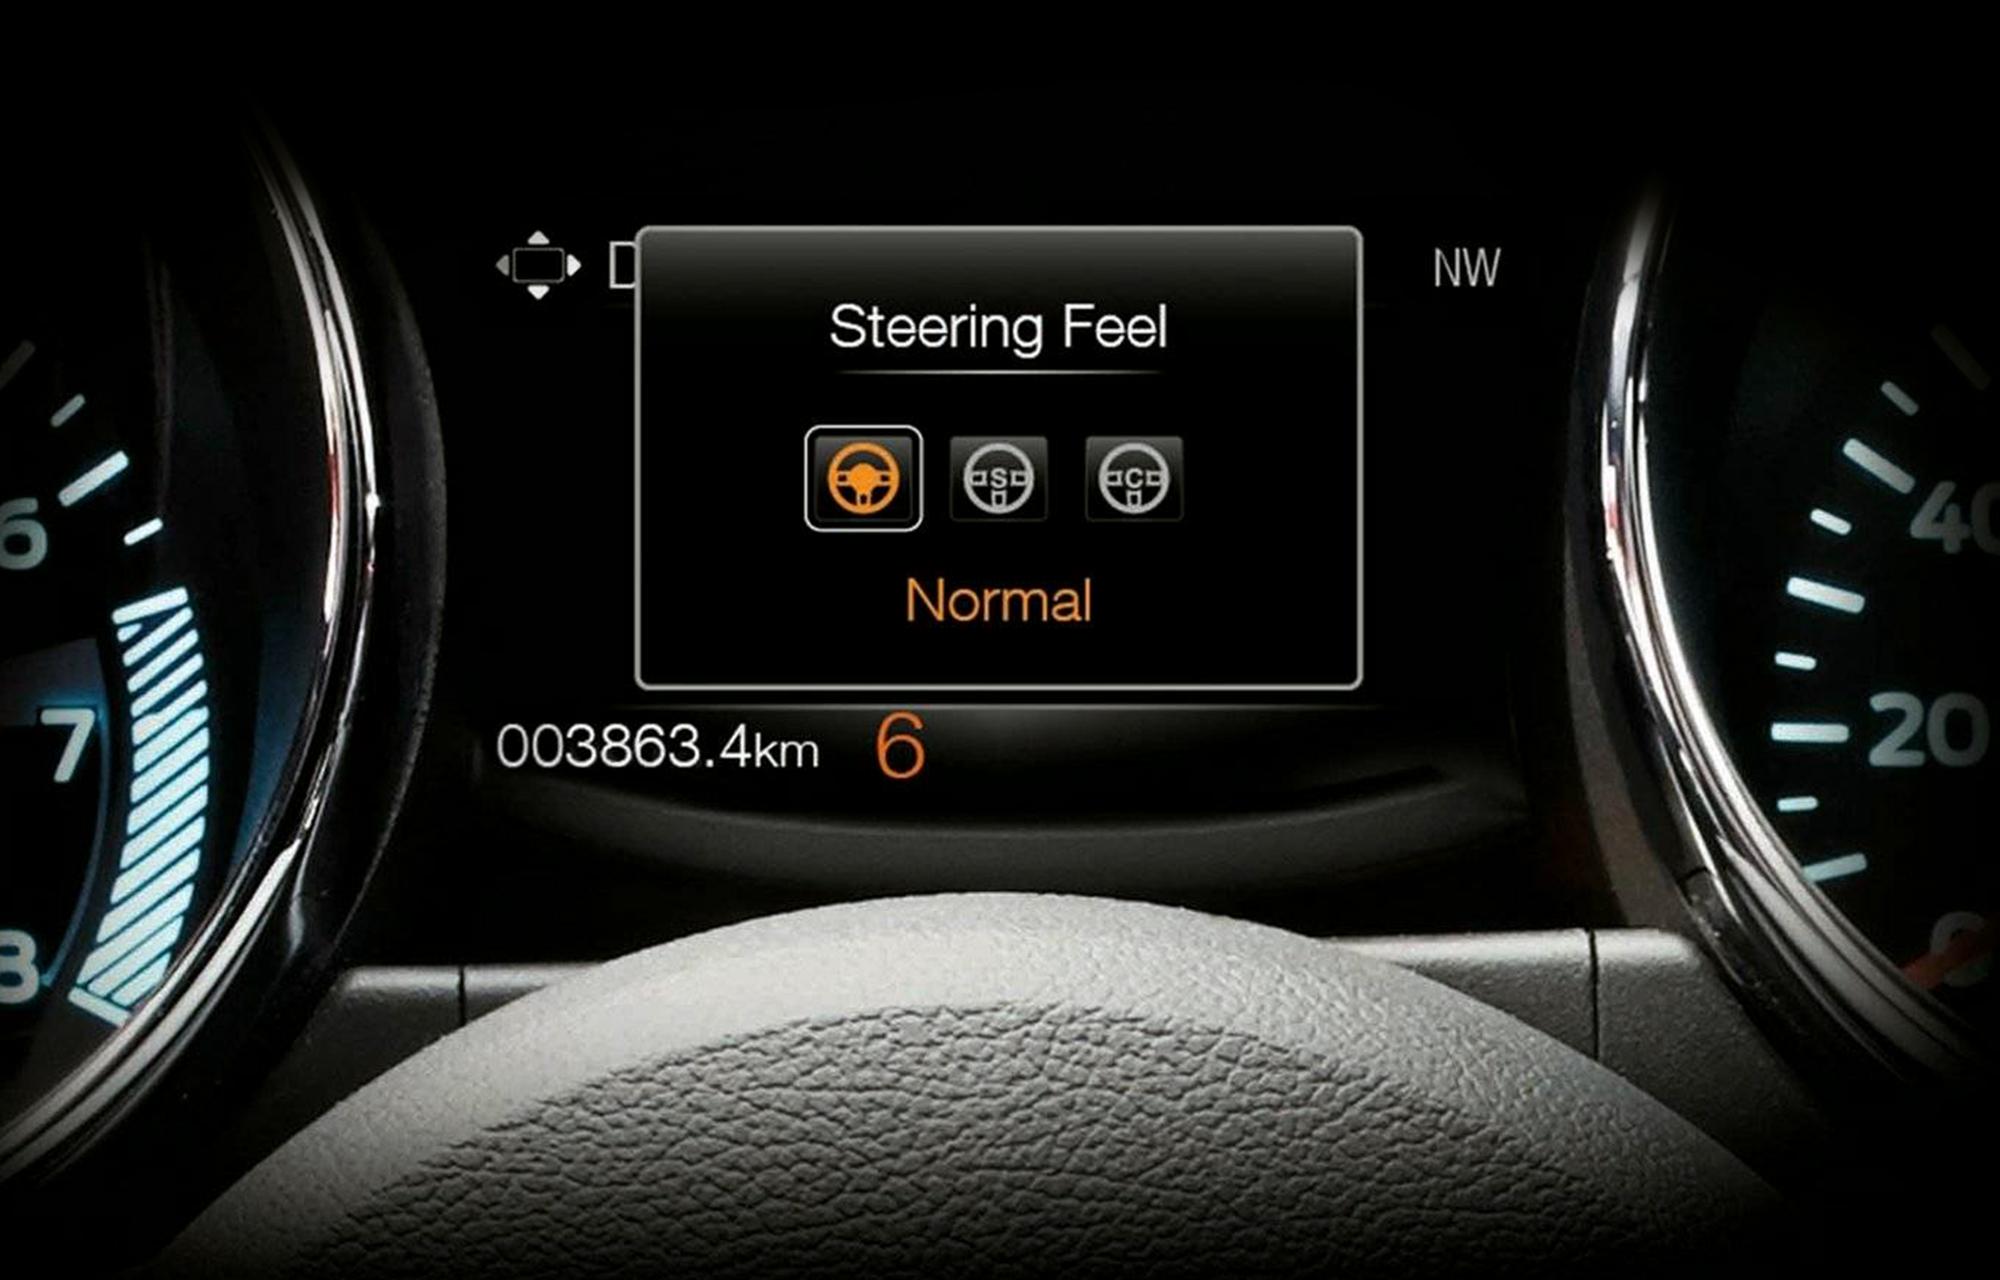 Ford Mustang Styrning